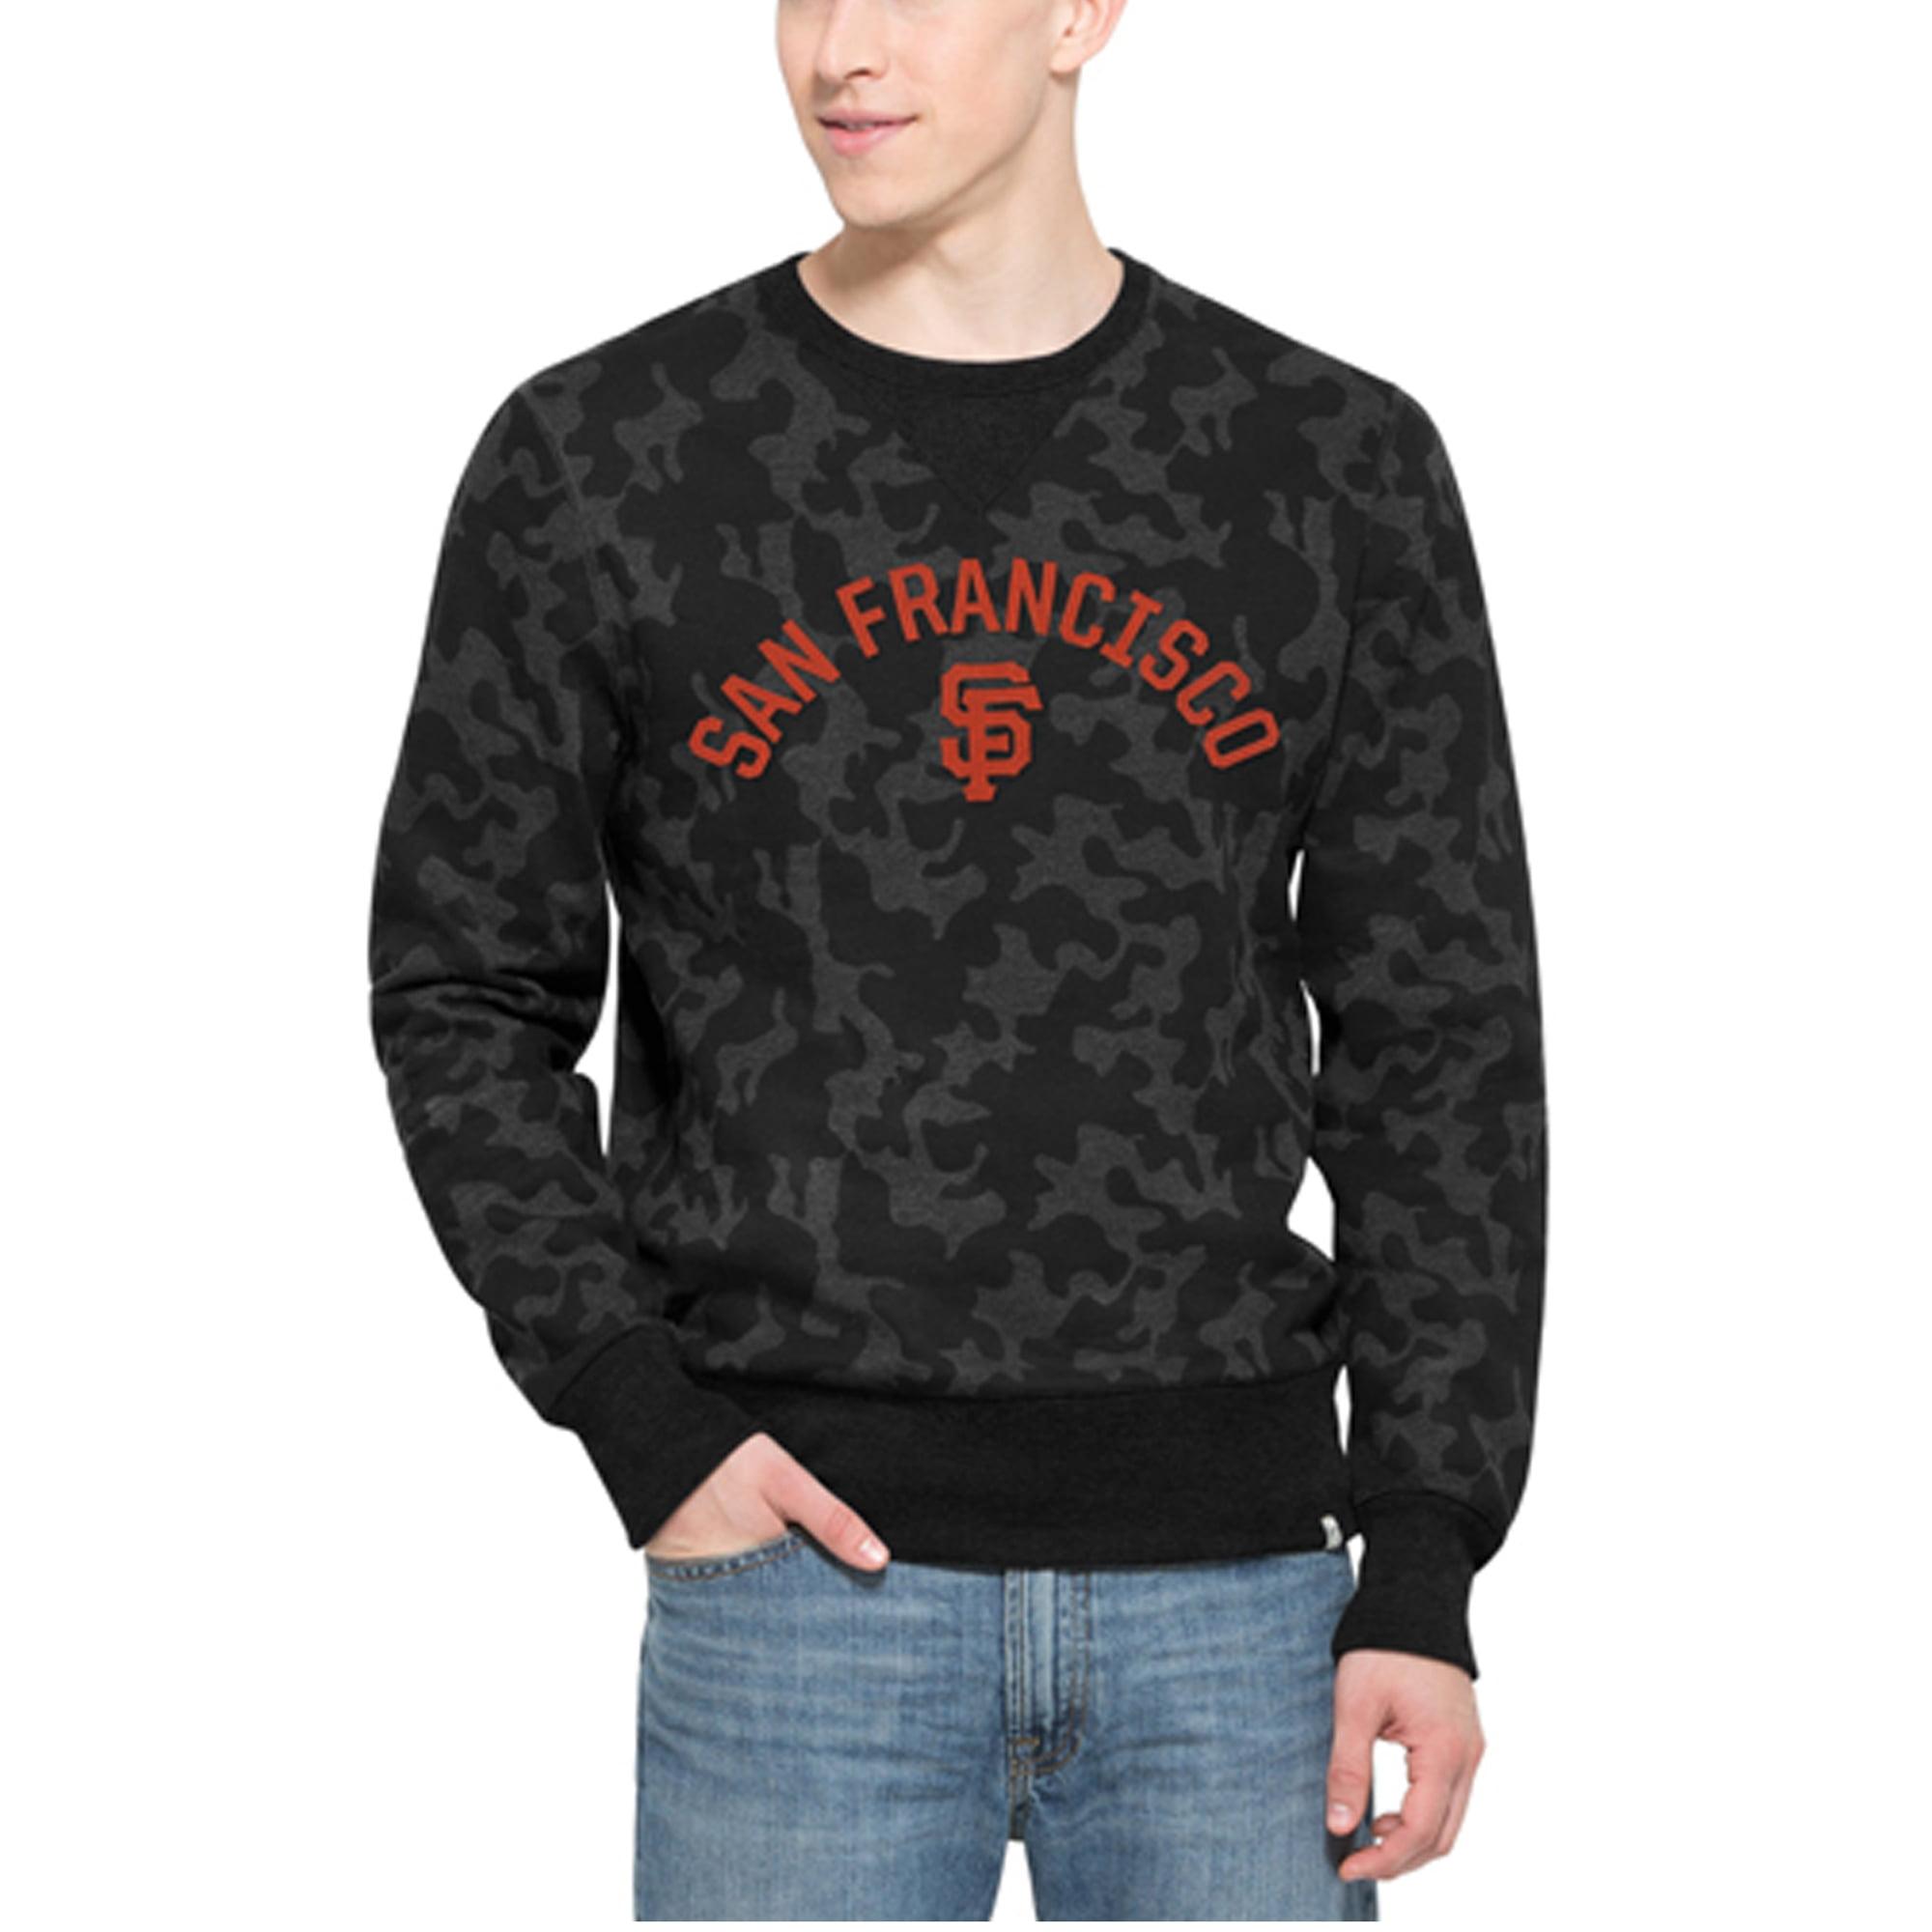 San Francisco Giants '47 Brand Stealth Camo Crew Sweatshirt - Black